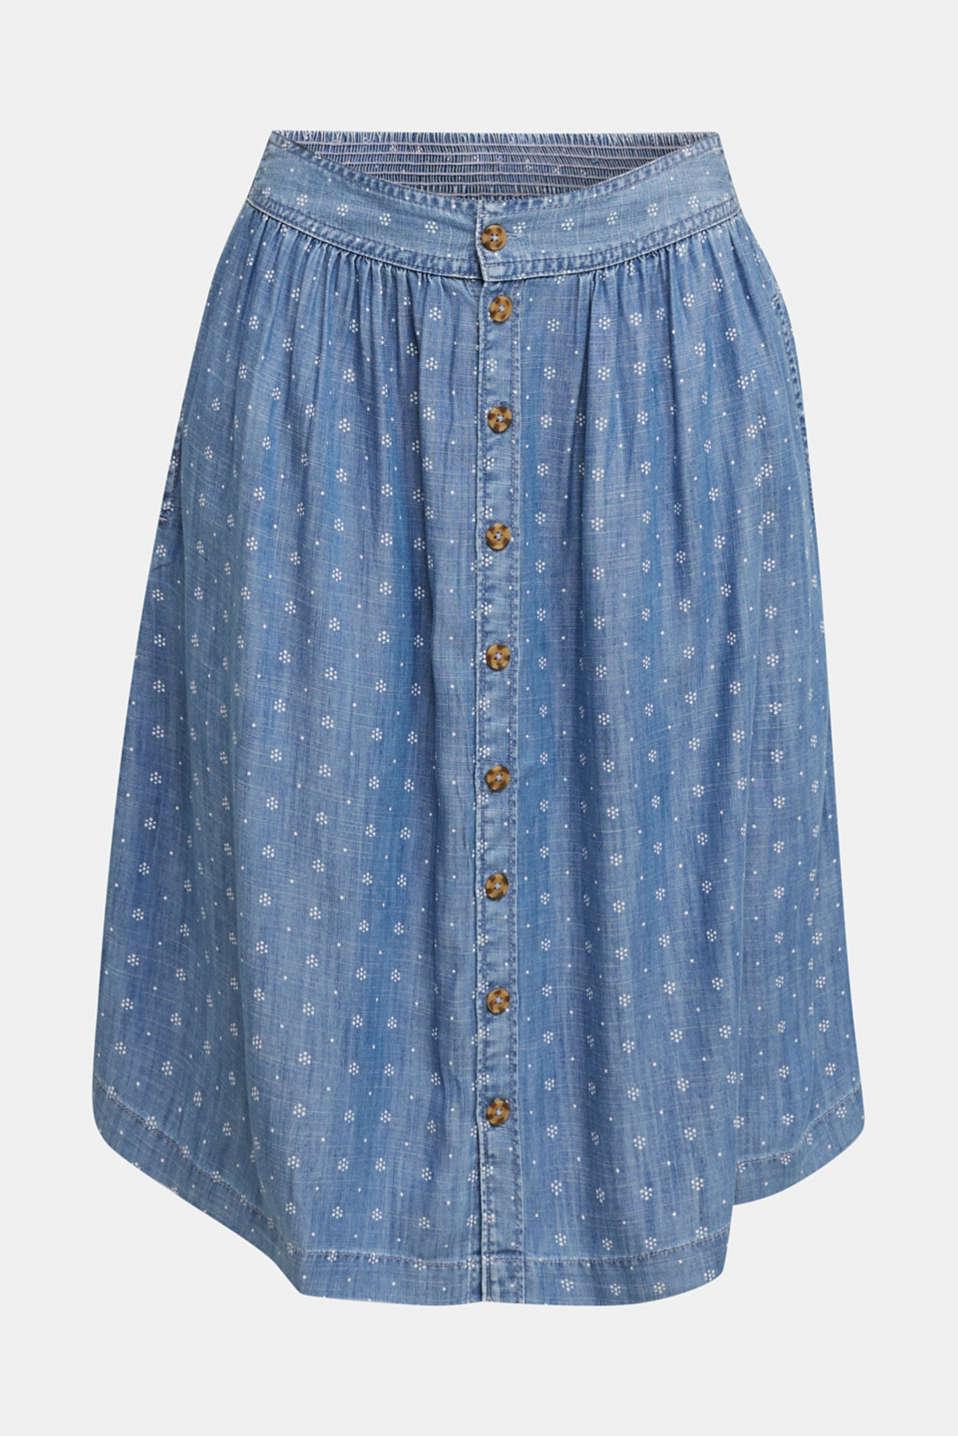 Denim-look skirt made of TENCEL™, BLUE MEDIUM WASH, detail image number 5